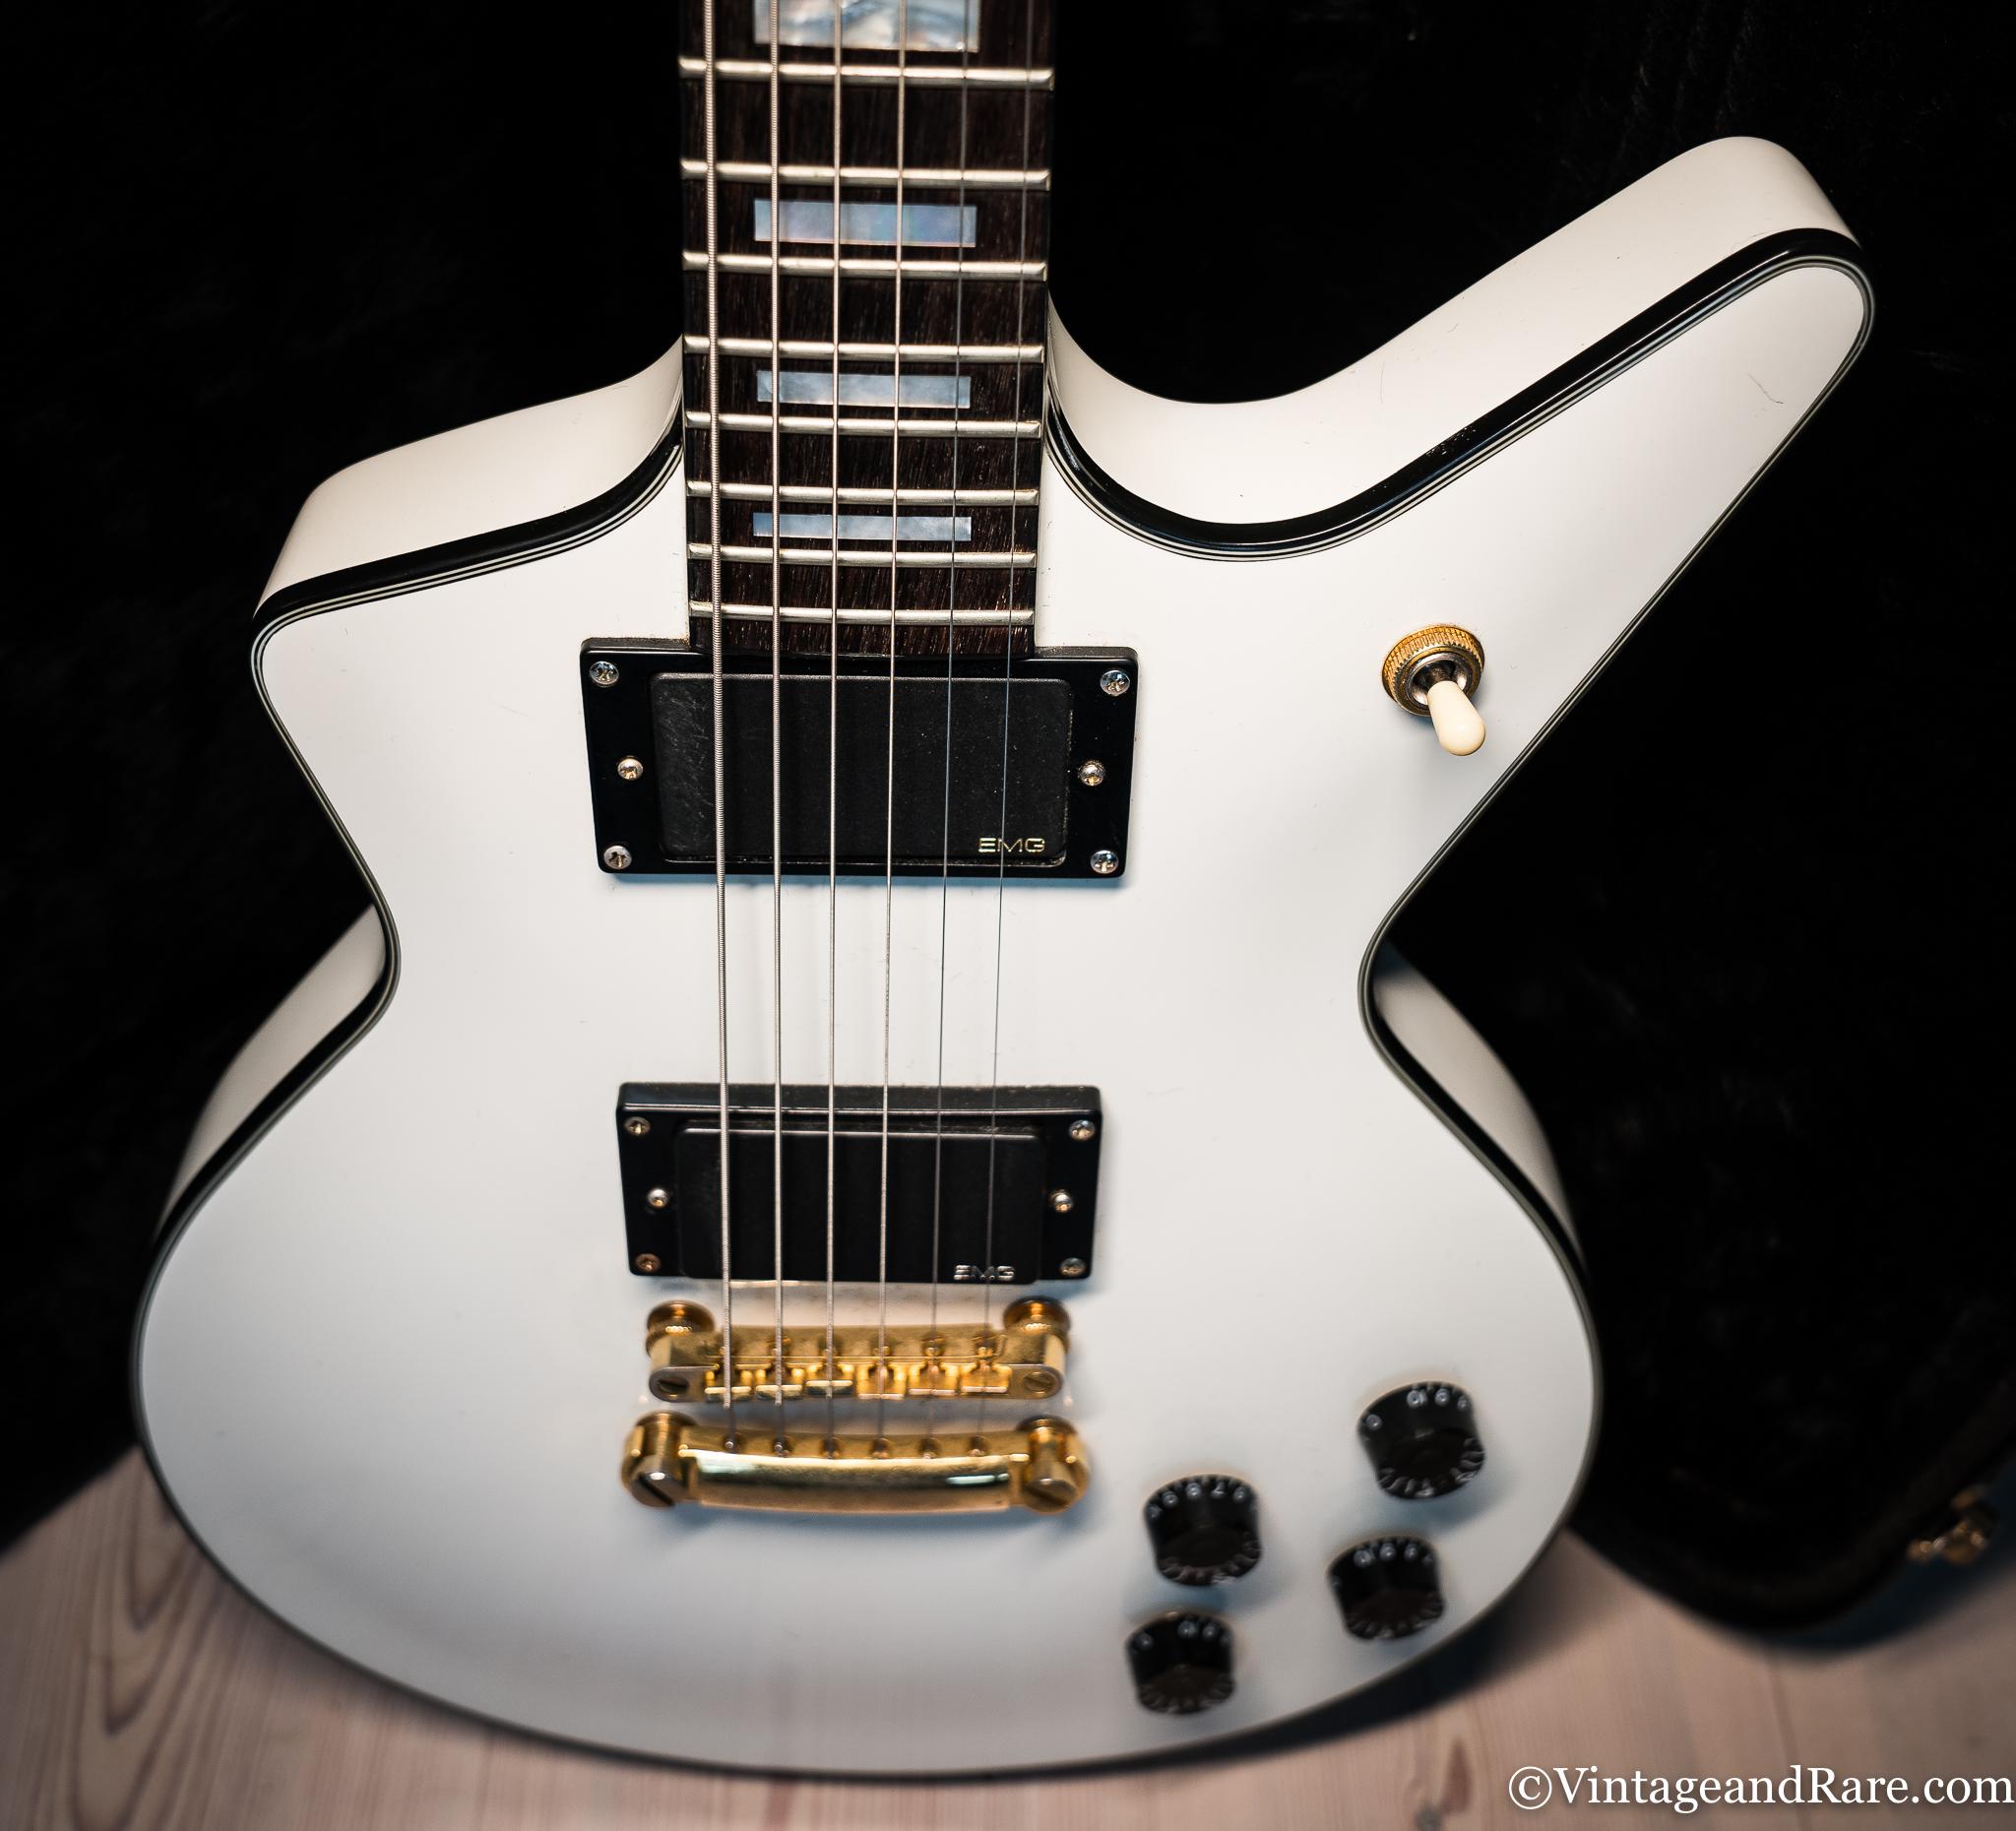 Dean Guitars Cadillac 2000's White Guitar For Sale The